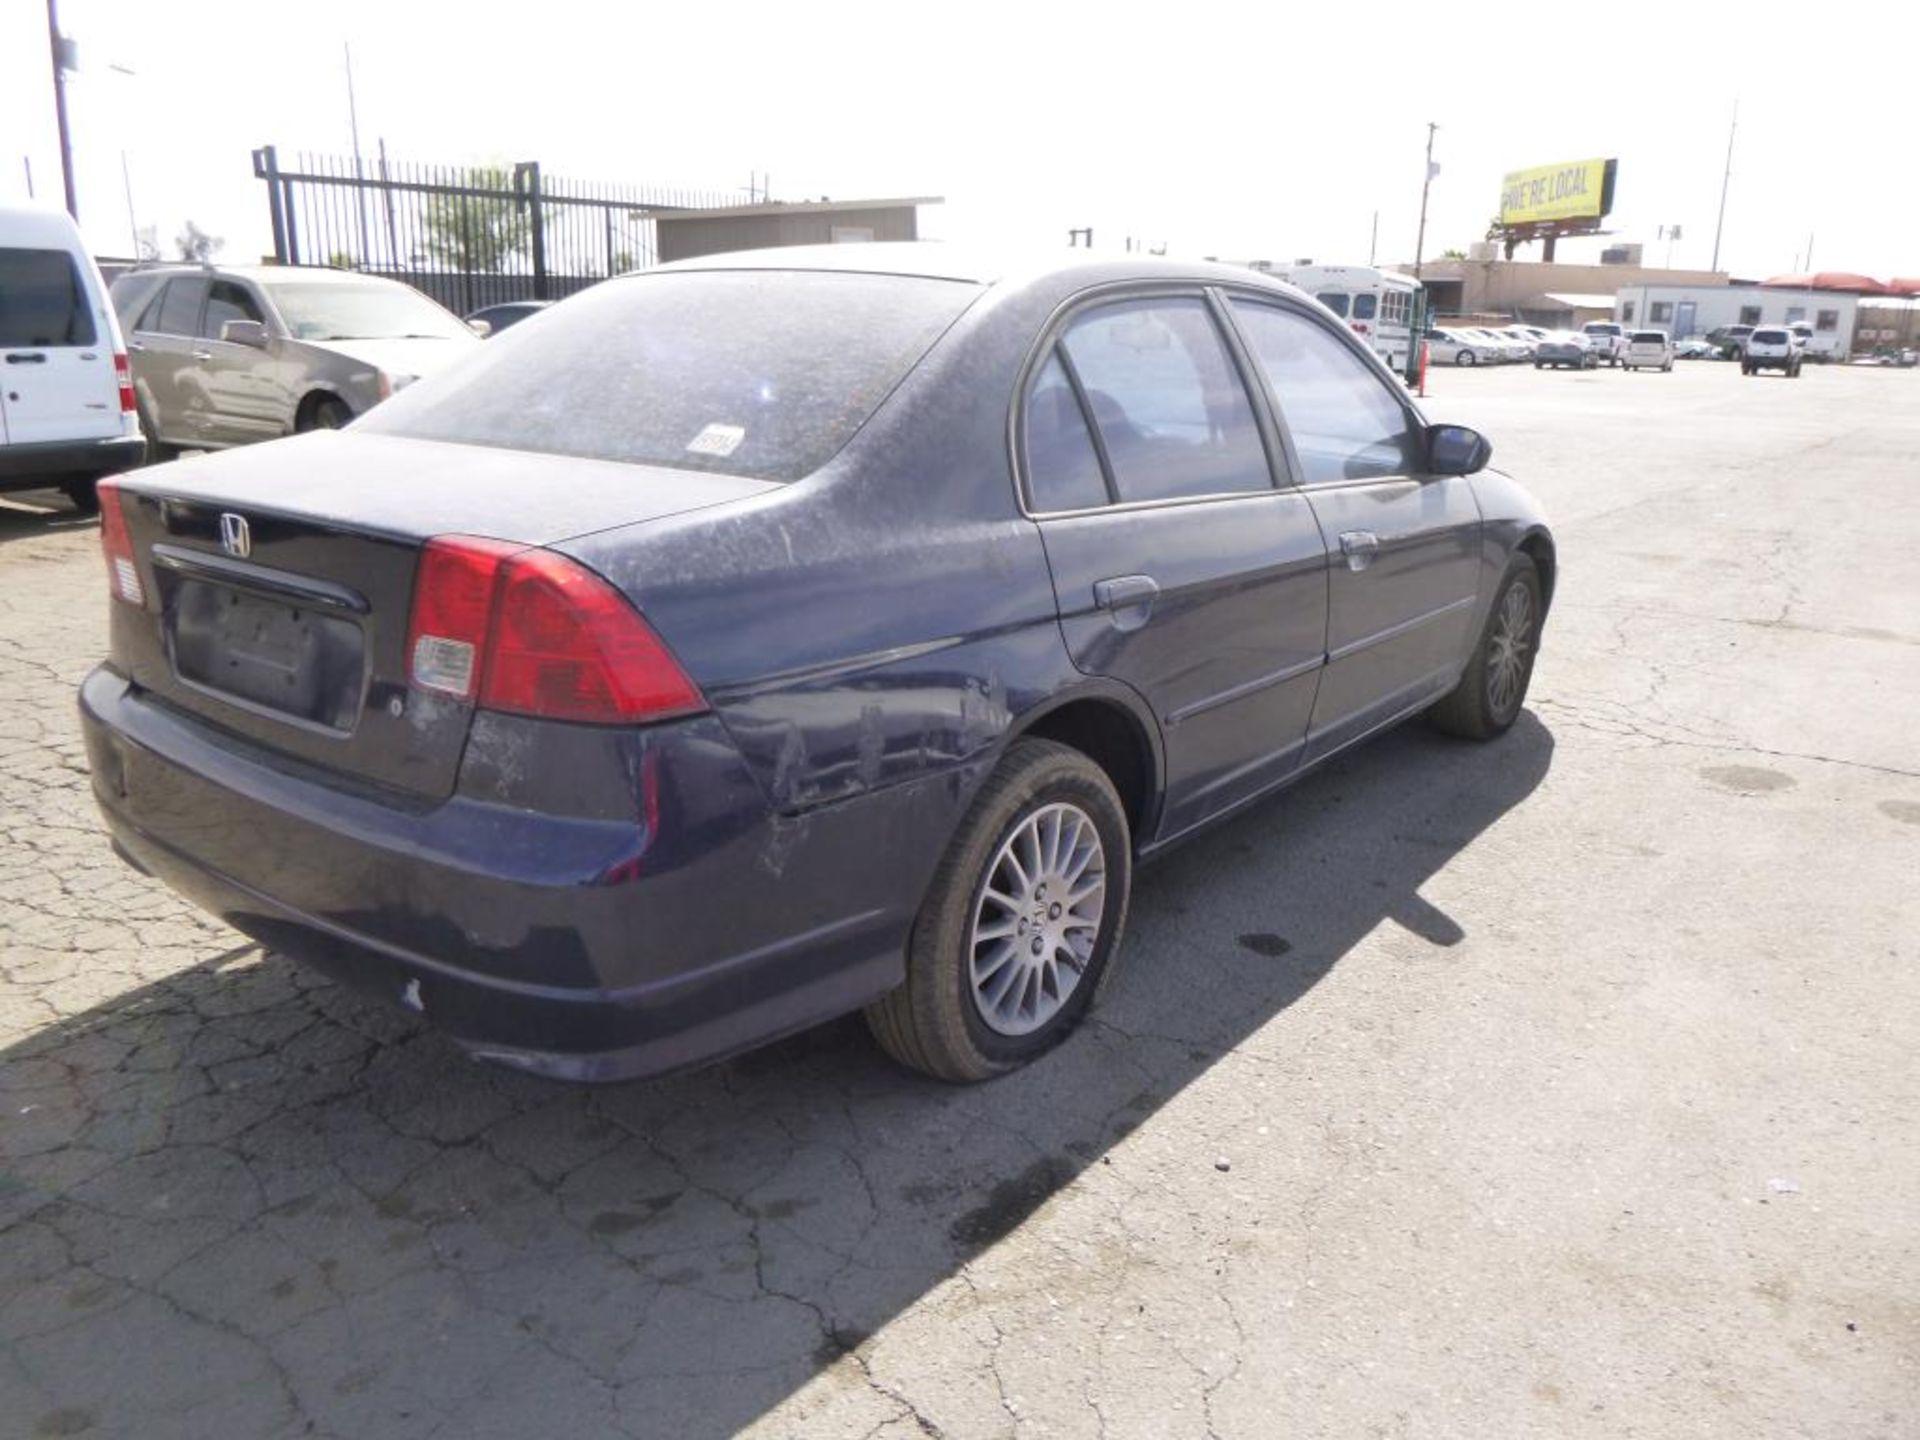 2004 Honda Civic - Image 3 of 14